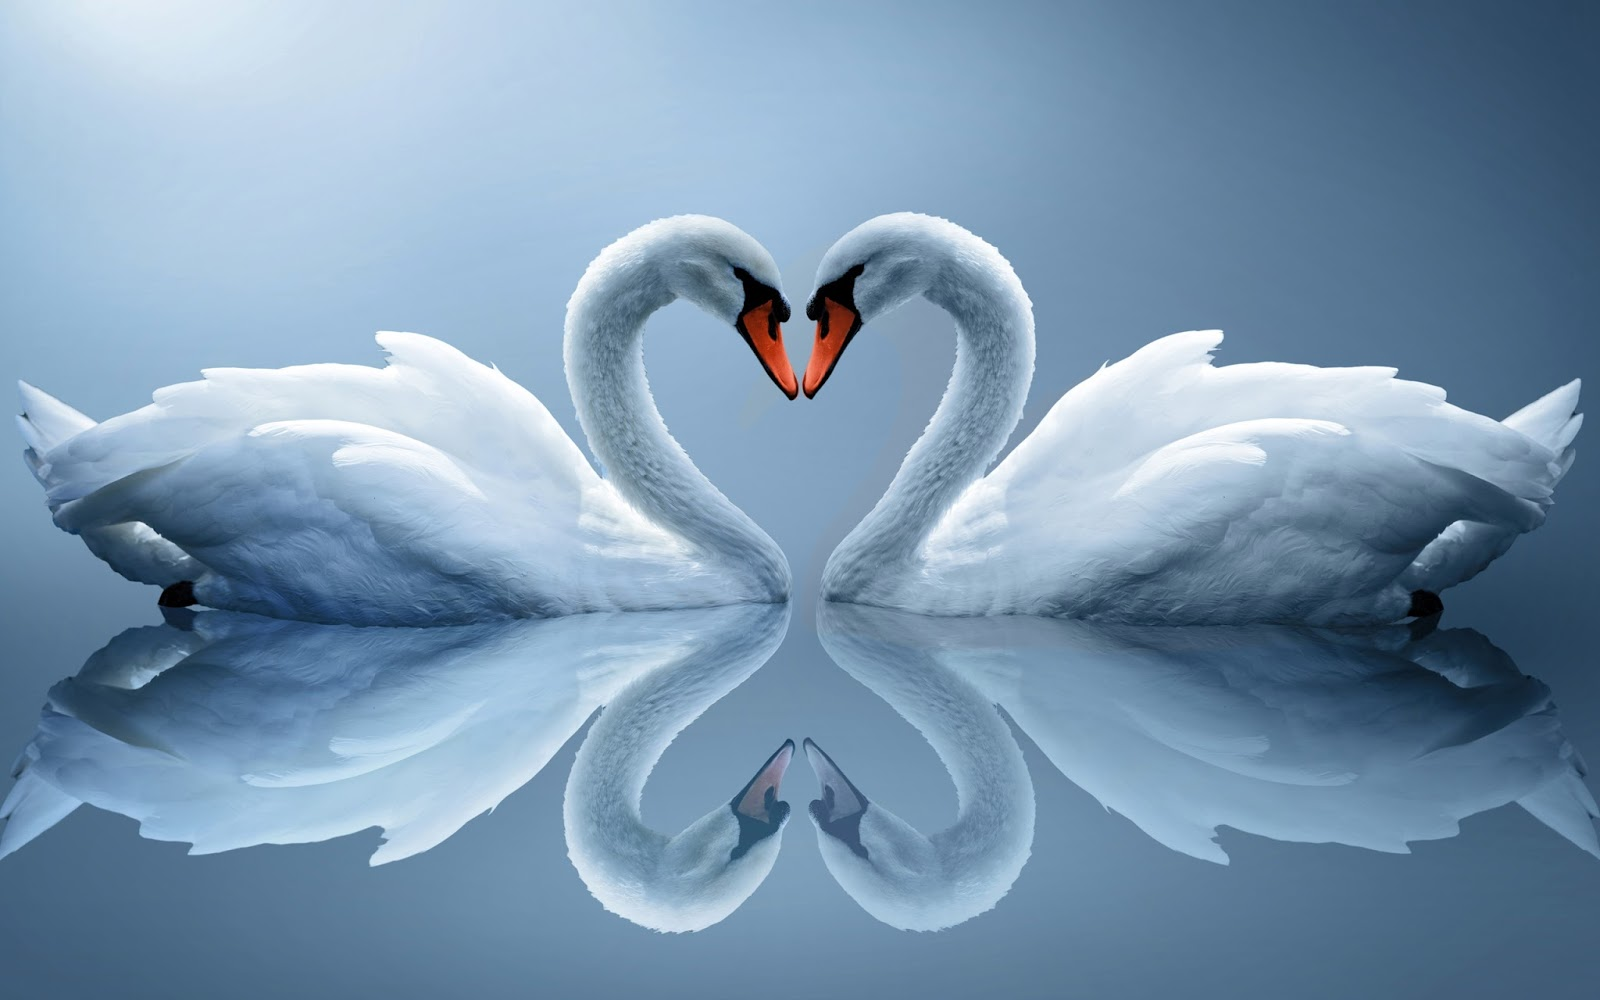 Beautiful Animal Couple Image Of Love Hd Desktop Wallpaper